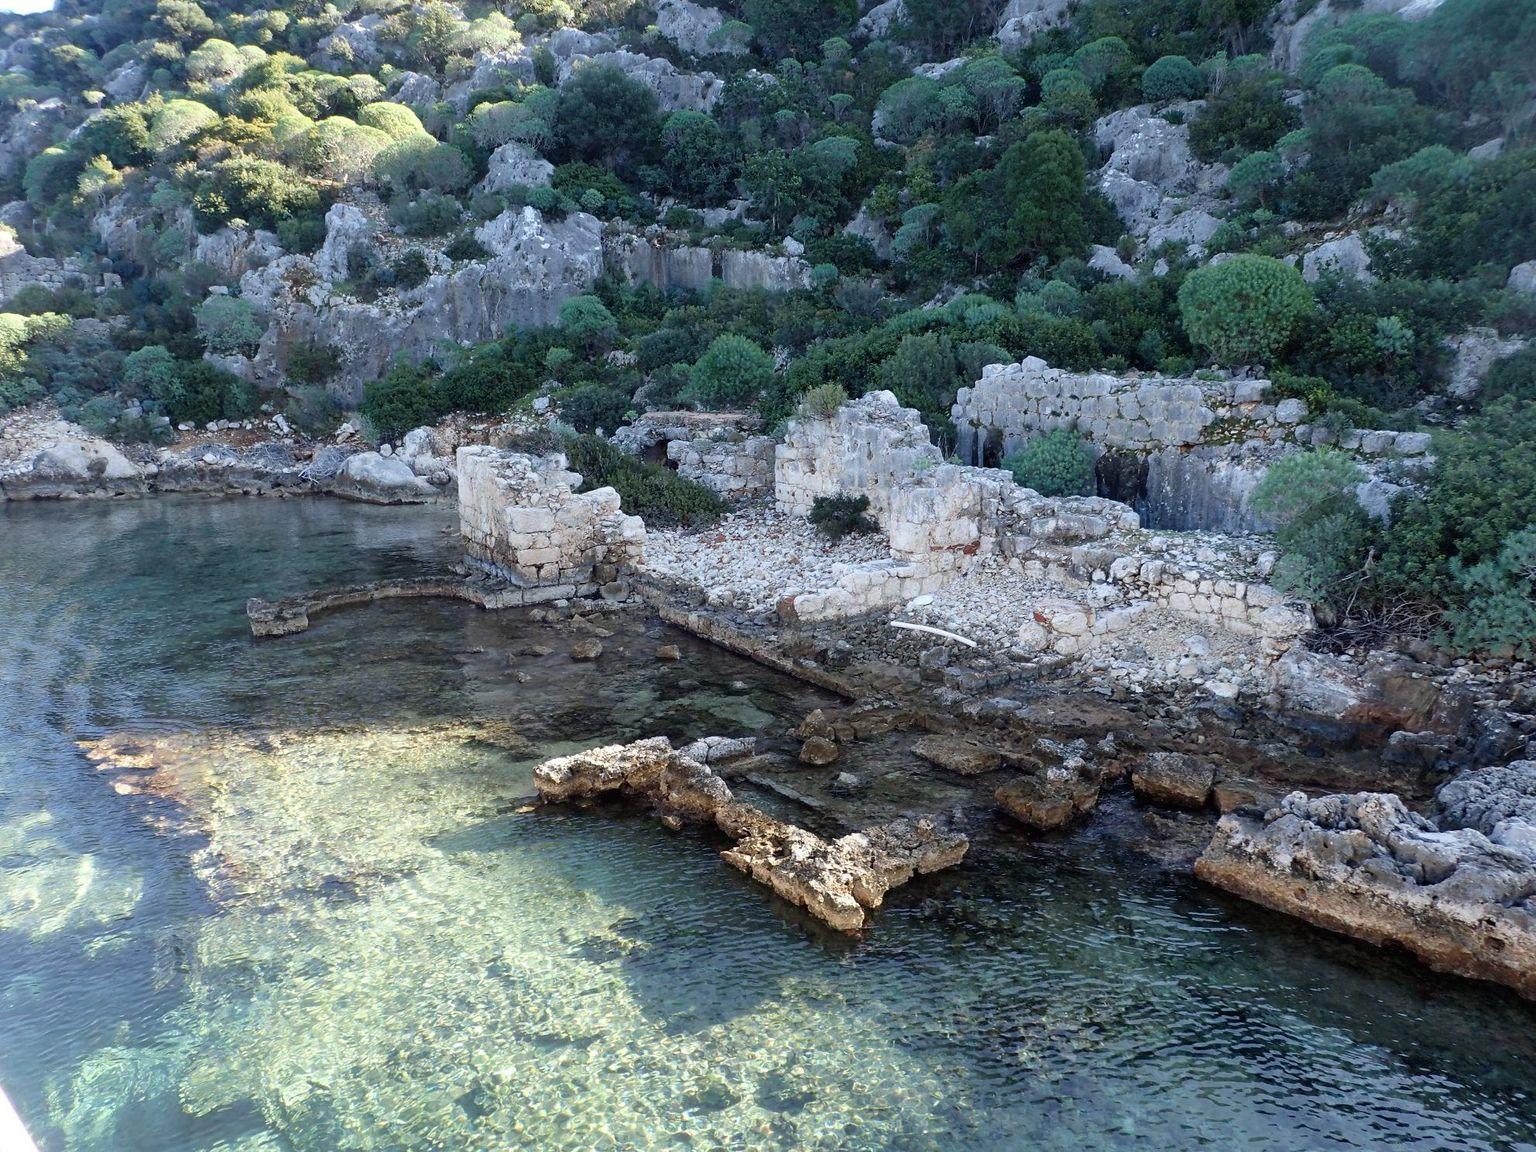 MORE PHOTOS, Sunken City Kekova, Demre, and Myra Day Tour from Antalya